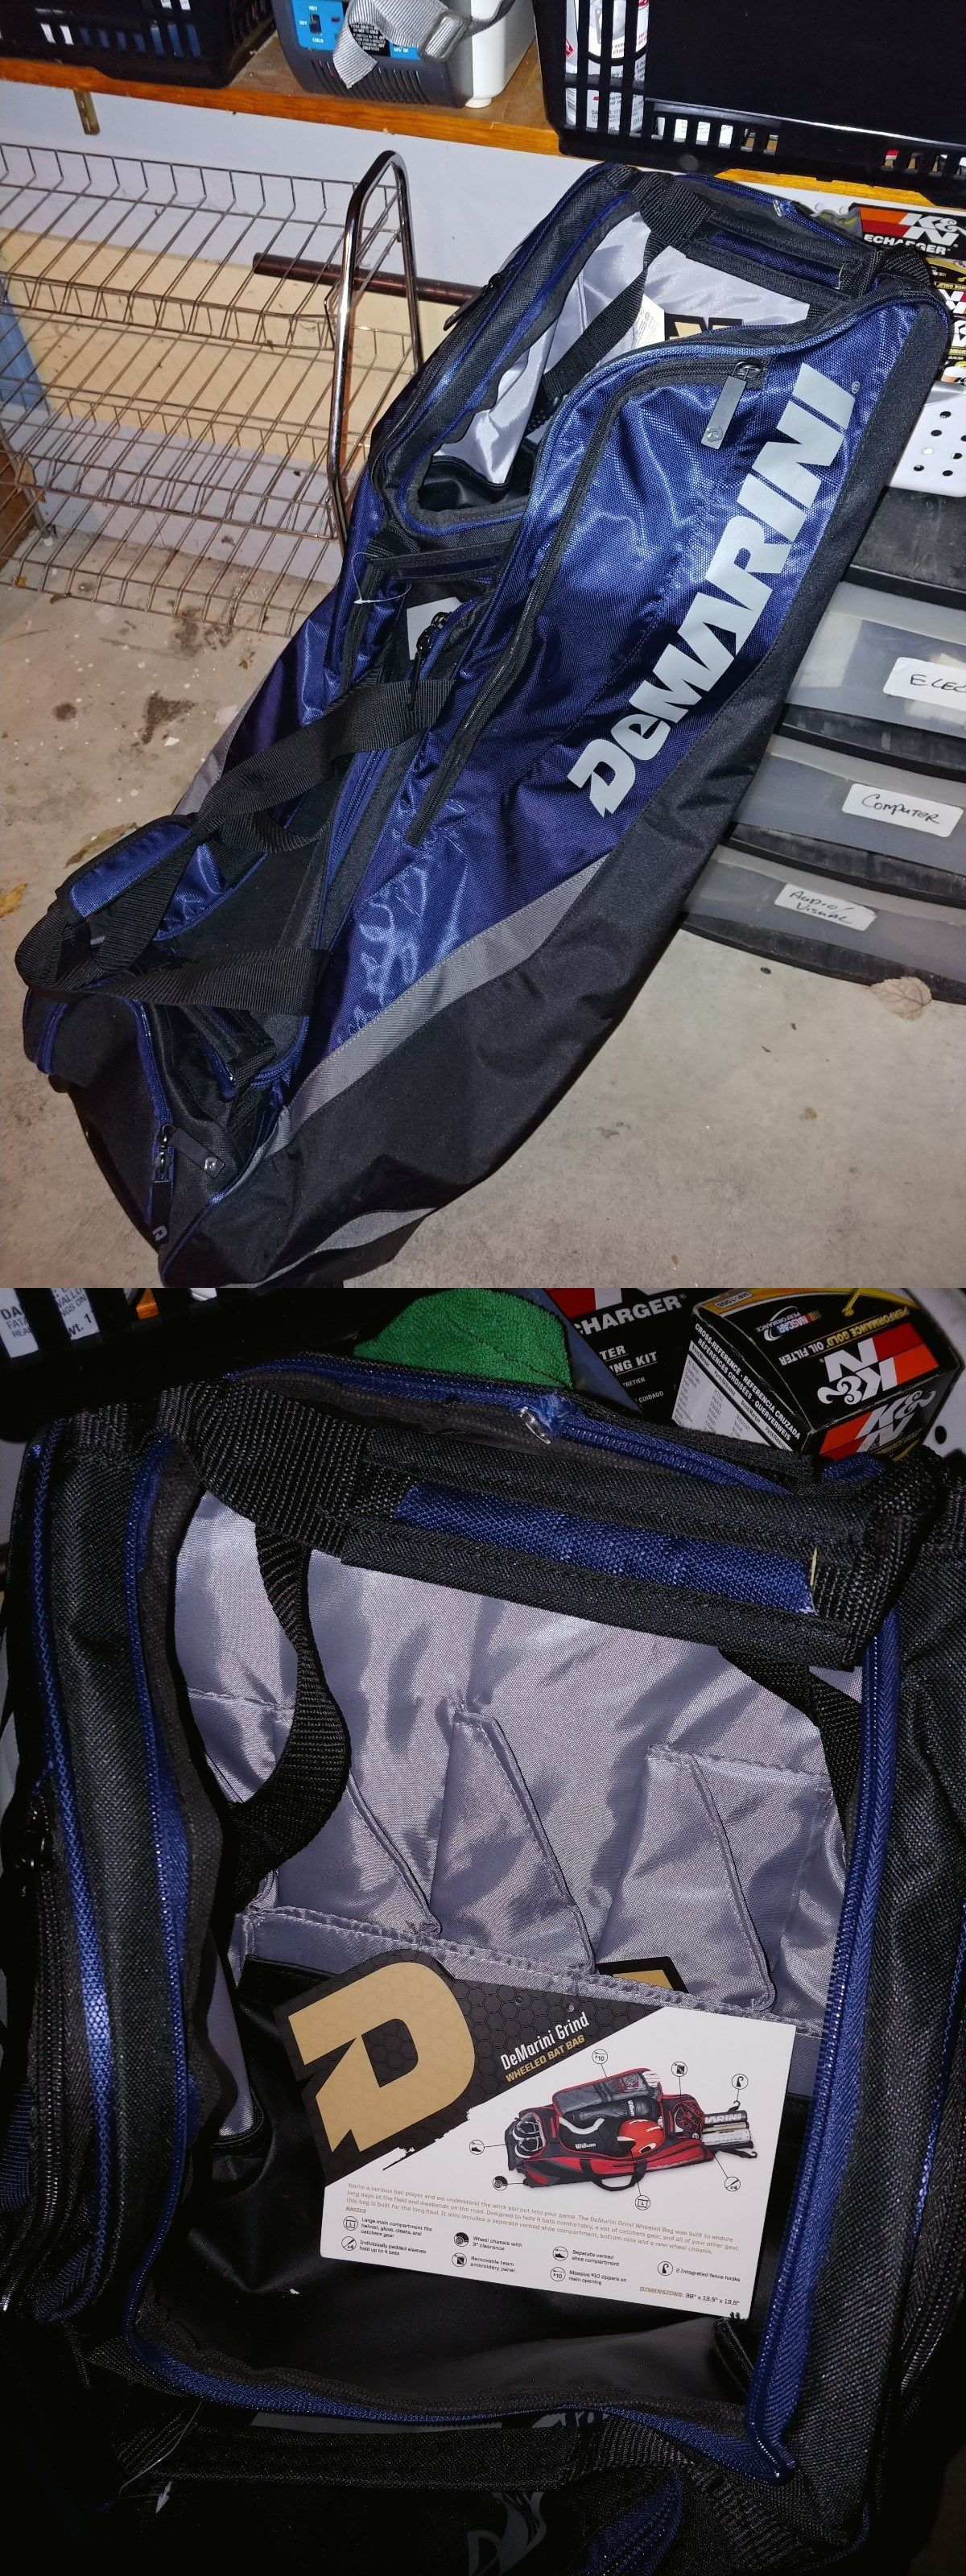 Equipment Bags 50807 Demarini Grind Baseball Softball Wheel Bag Blue Catcher S 4 Bats Blemish It Now Only 70 On Ebay